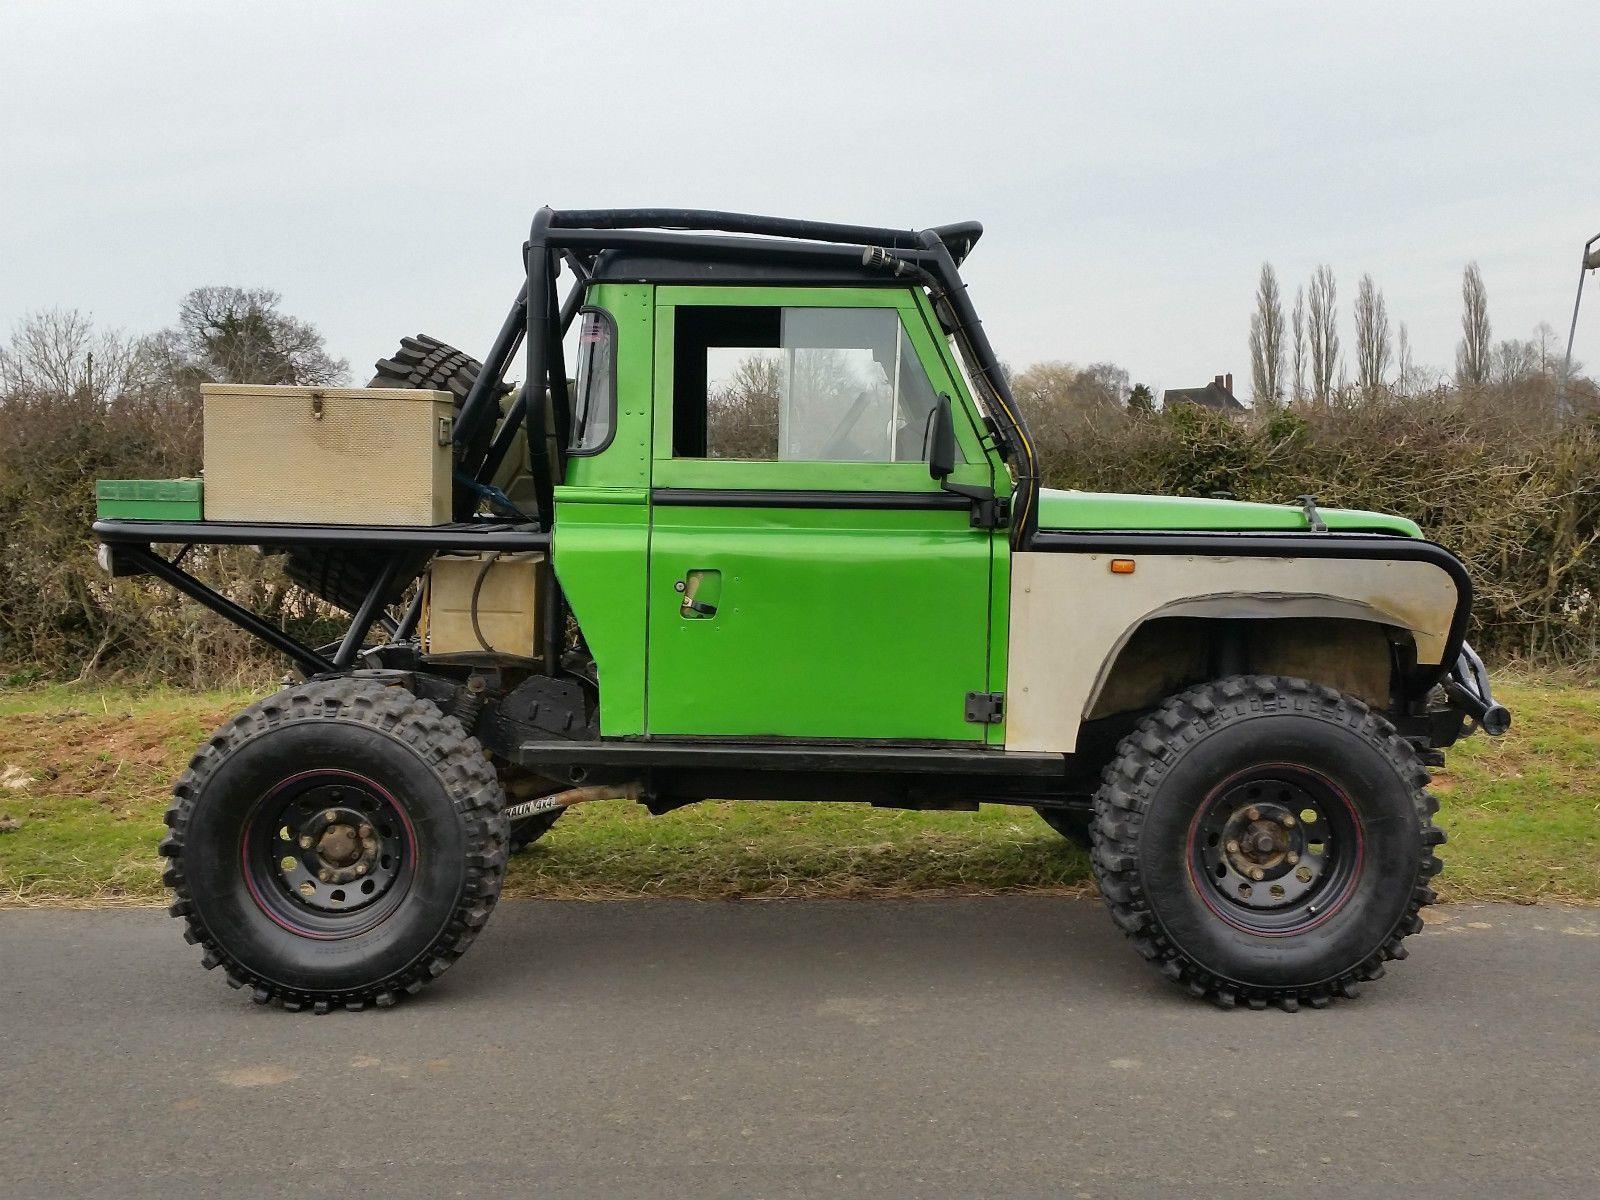 Land rover defender 90 tray back challenge truck stunning